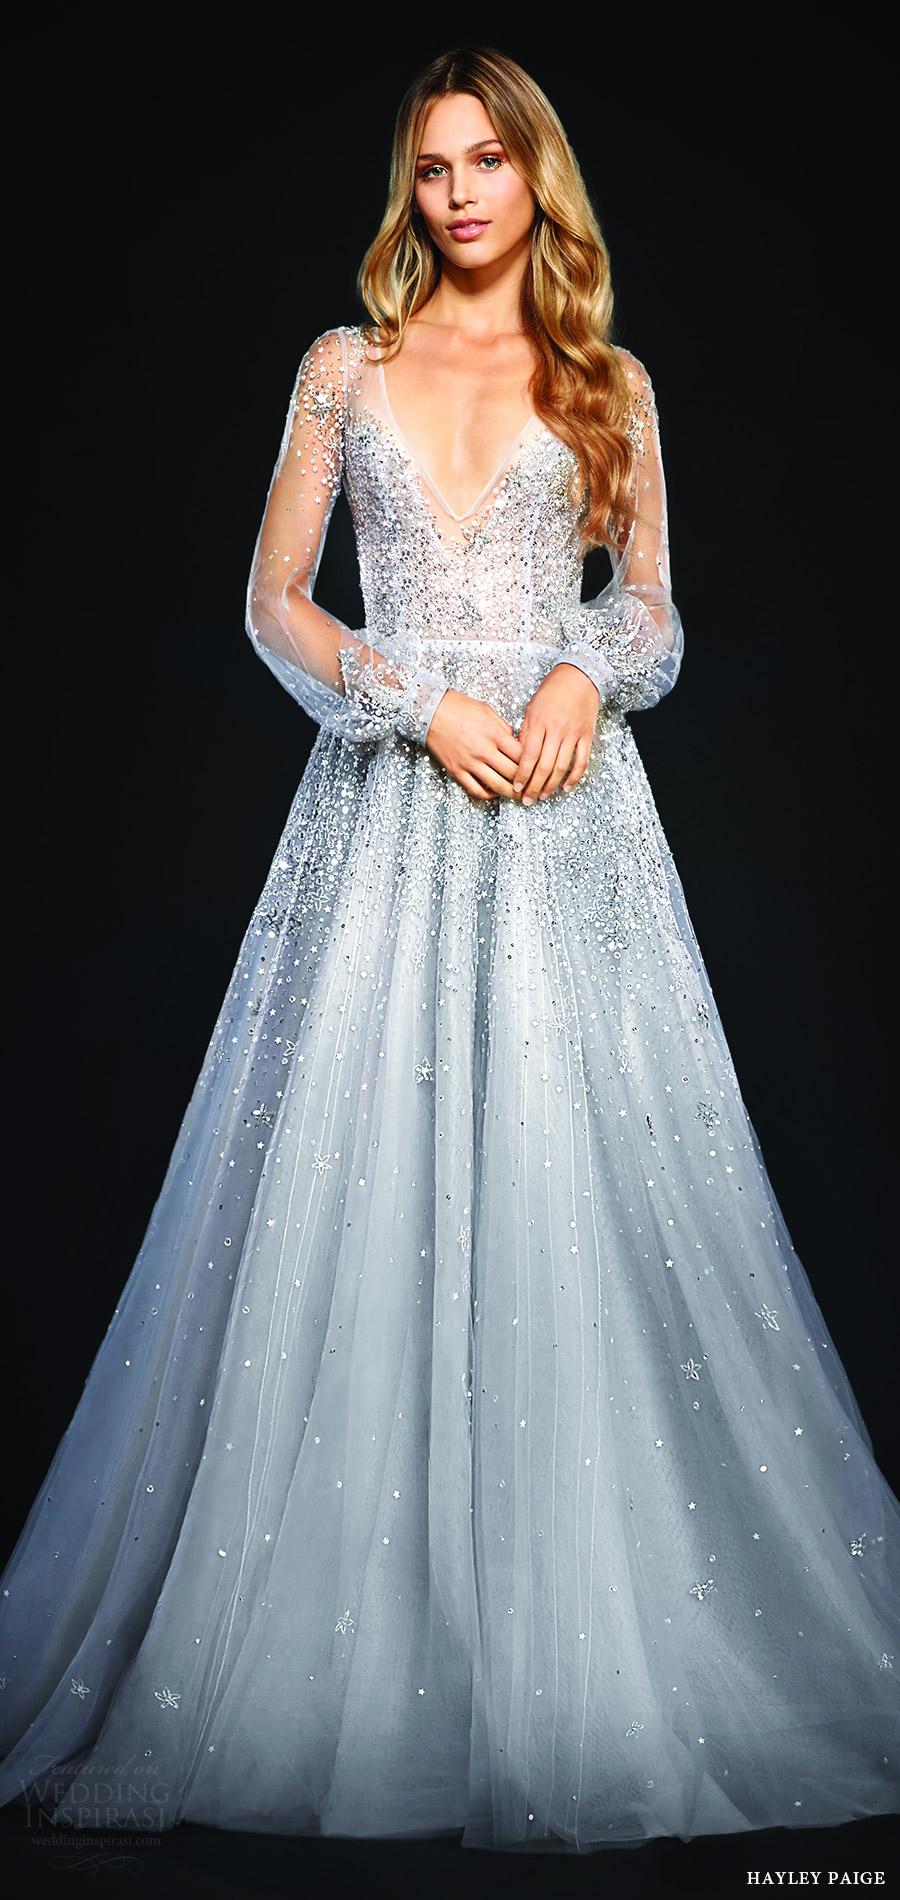 Wedding Dress Trends for 2017 - Part 2 - crazyforus